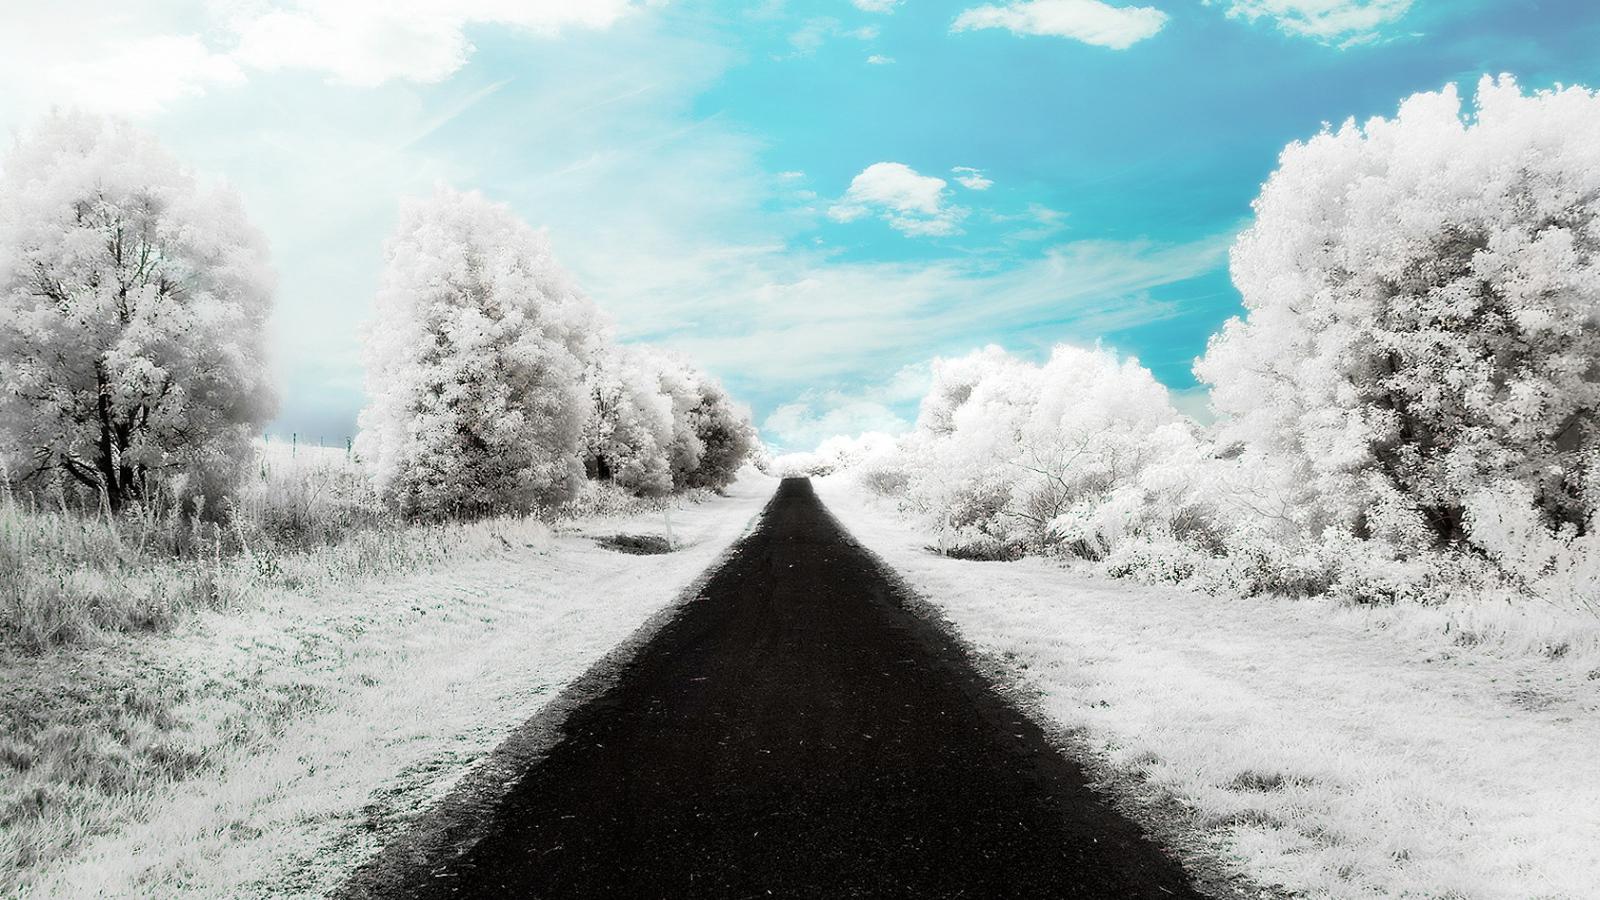 1600x900 hd desktop wallpaper winter - photo #12